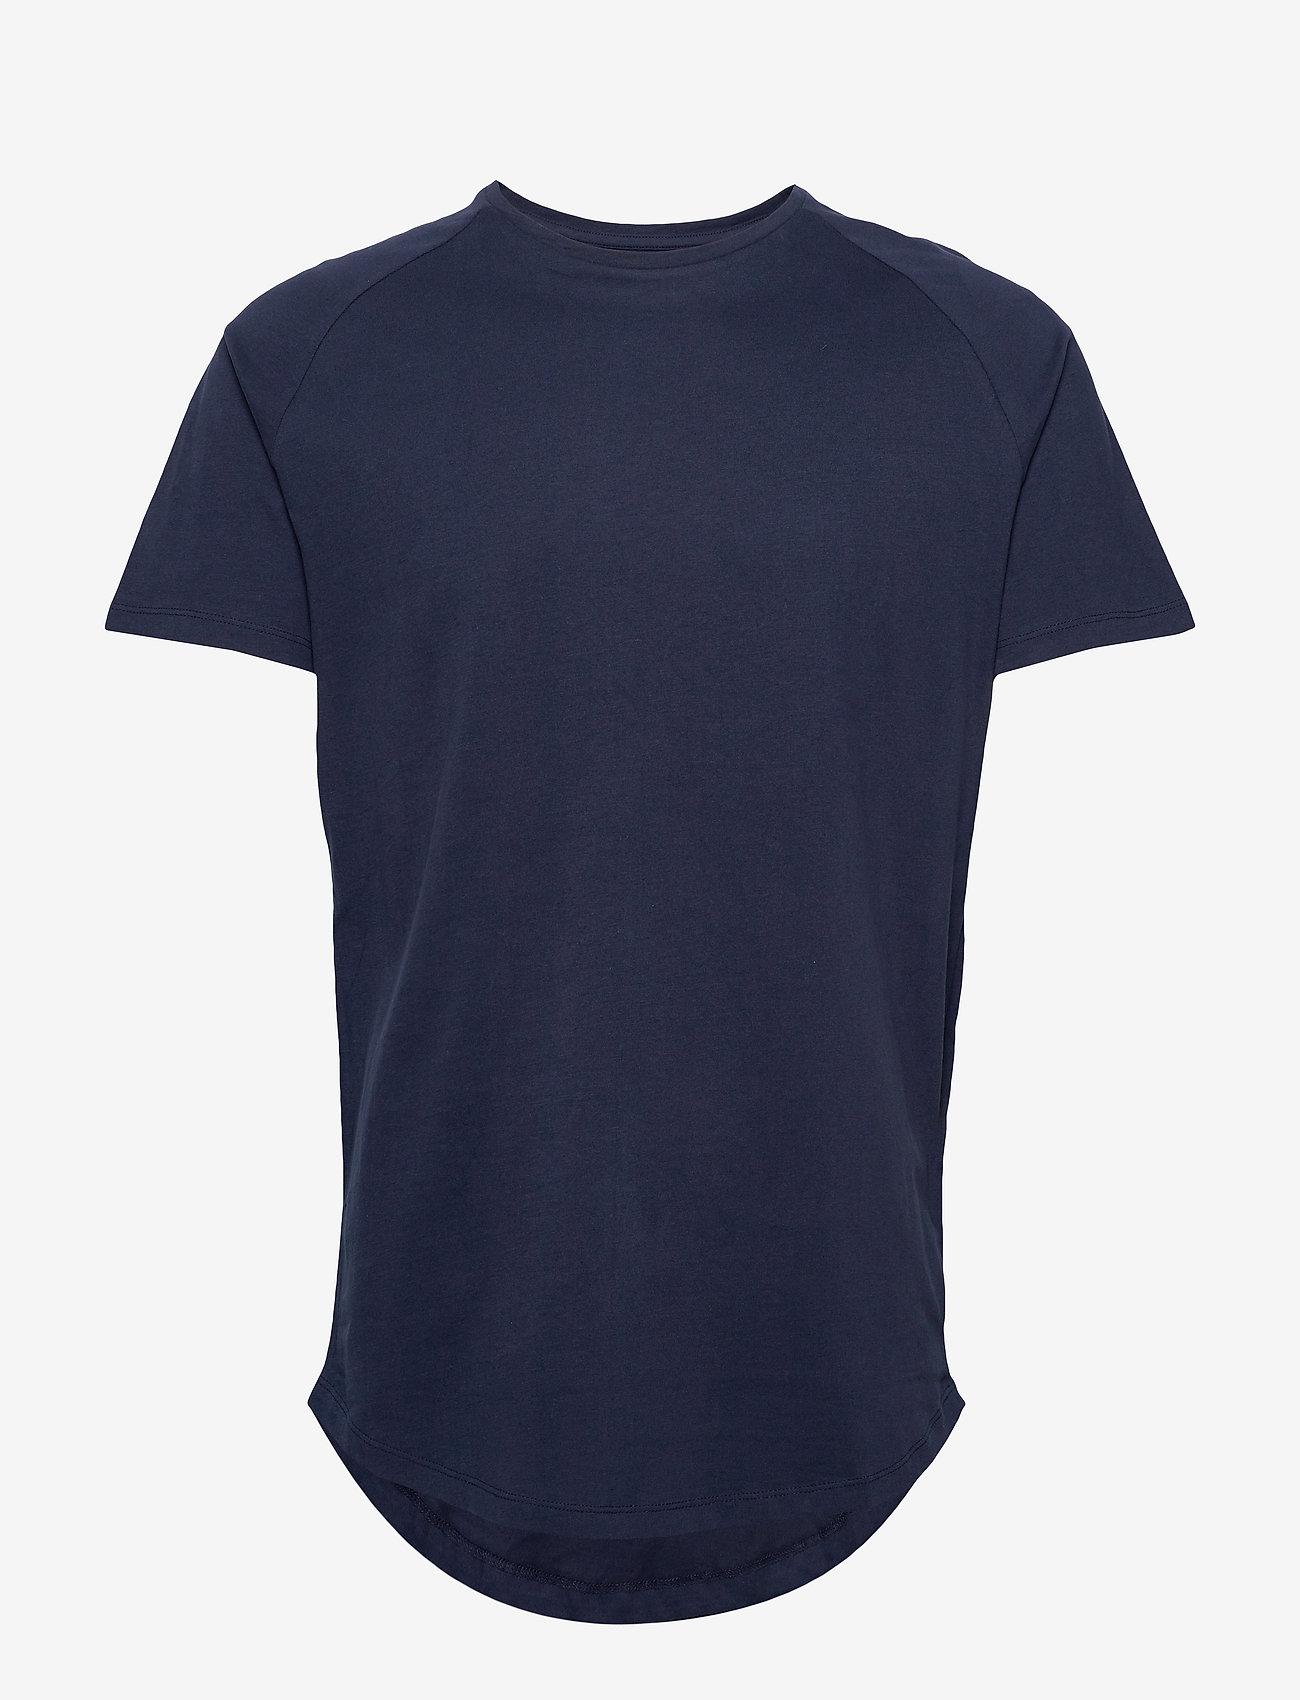 Jack & Jones - JJECURVED TEE SS O-NECK NOOS - basic t-shirts - navy blazer - 0